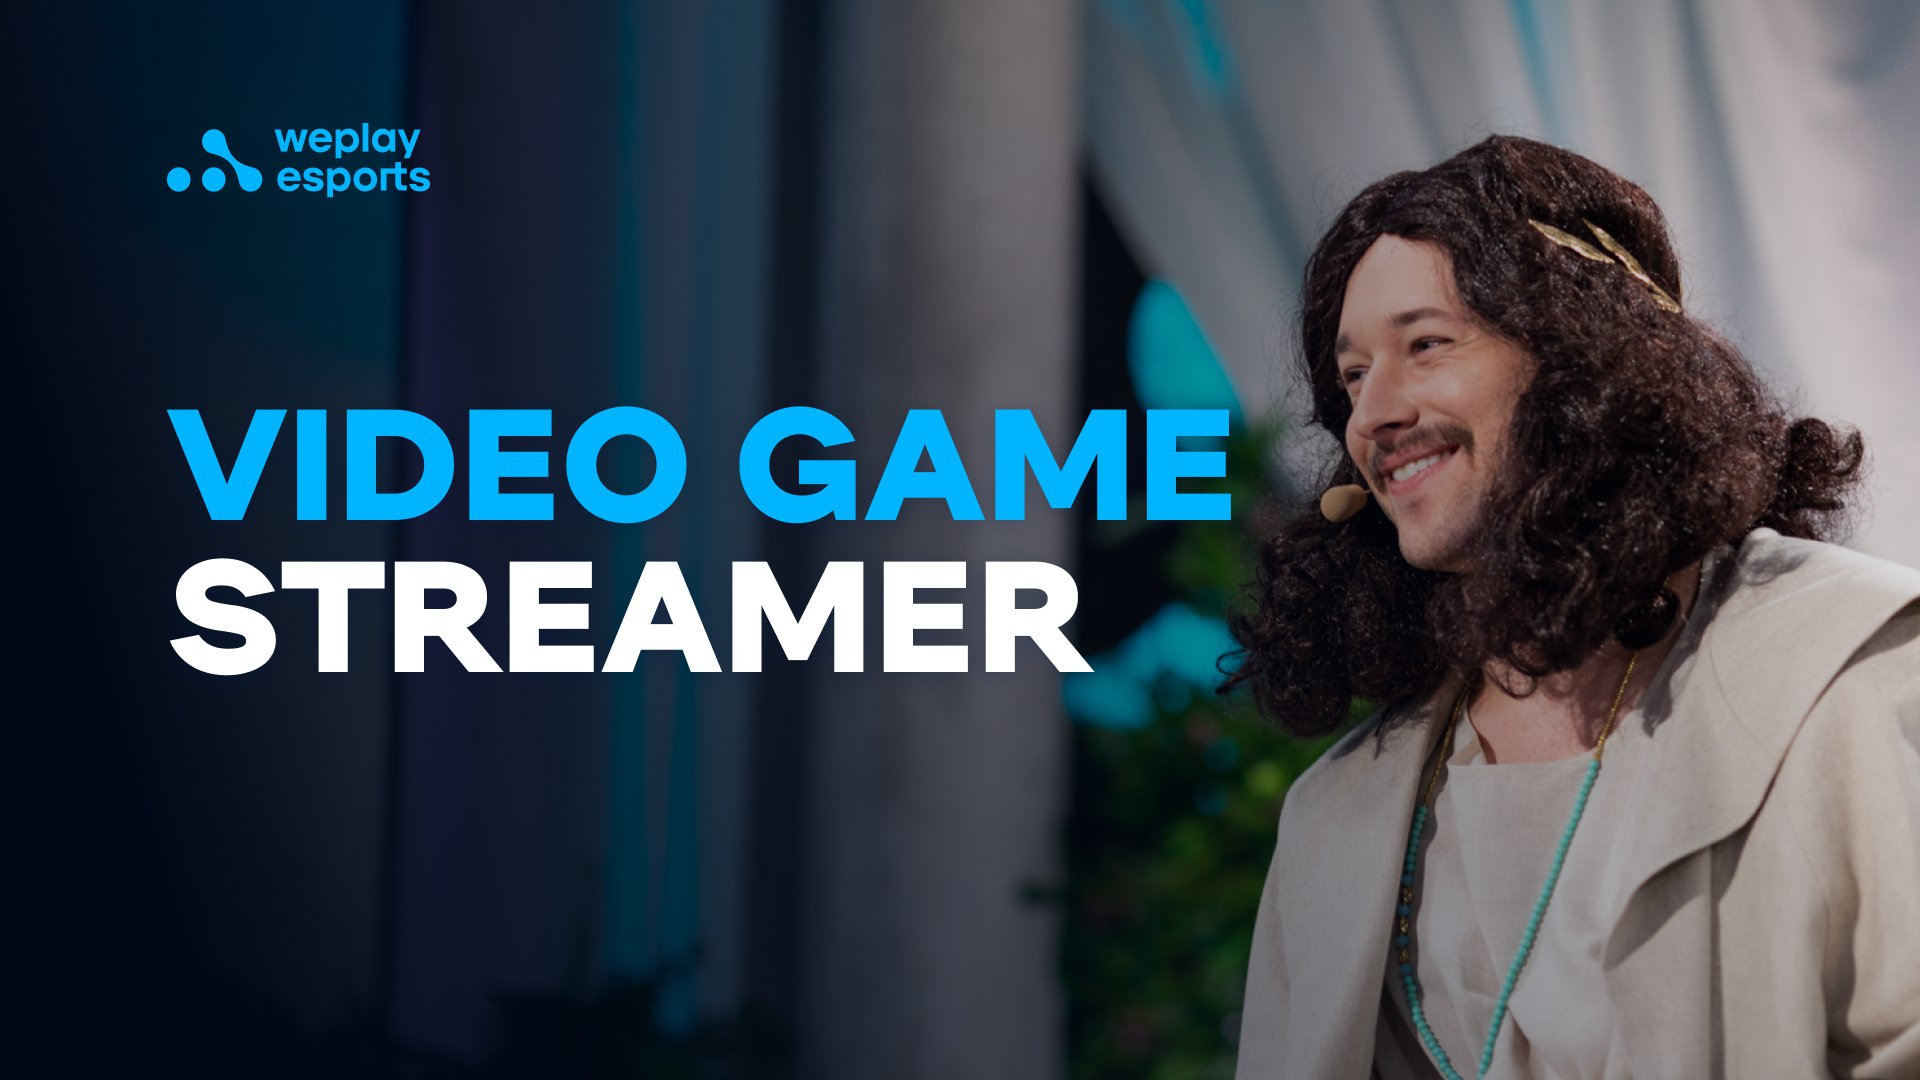 Video Game Streamer